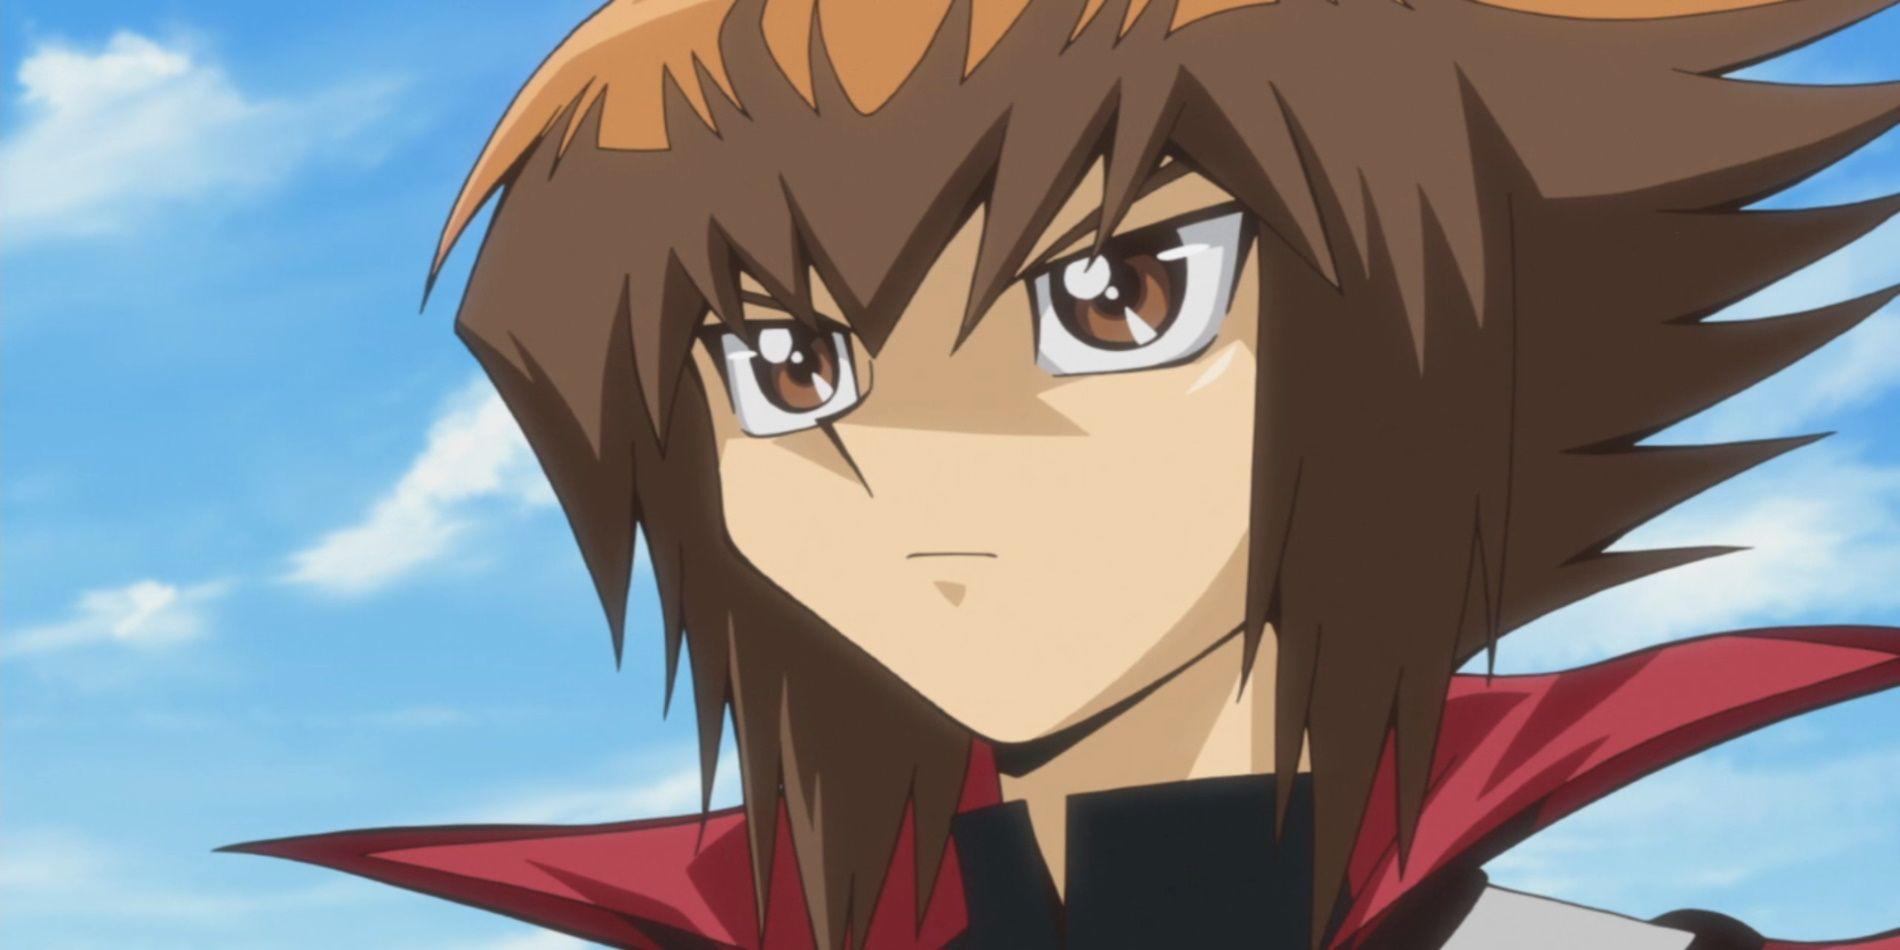 Yu-Gi-Oh! GX Image #2060869 - Zerochan Anime Image Board